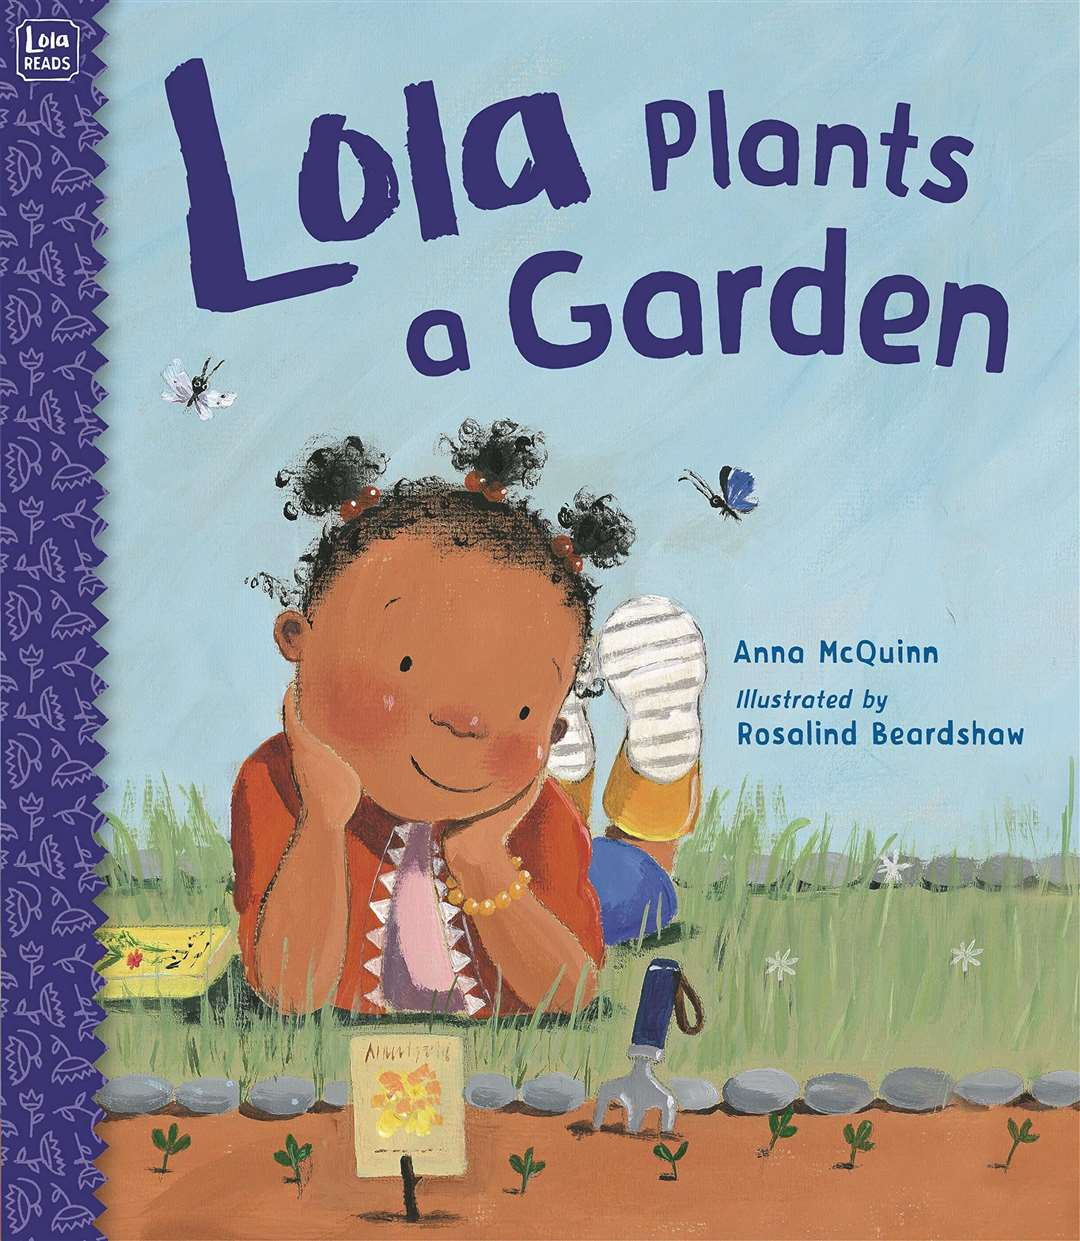 Lola Plants a Garden by Anna McQuinn (46204152)